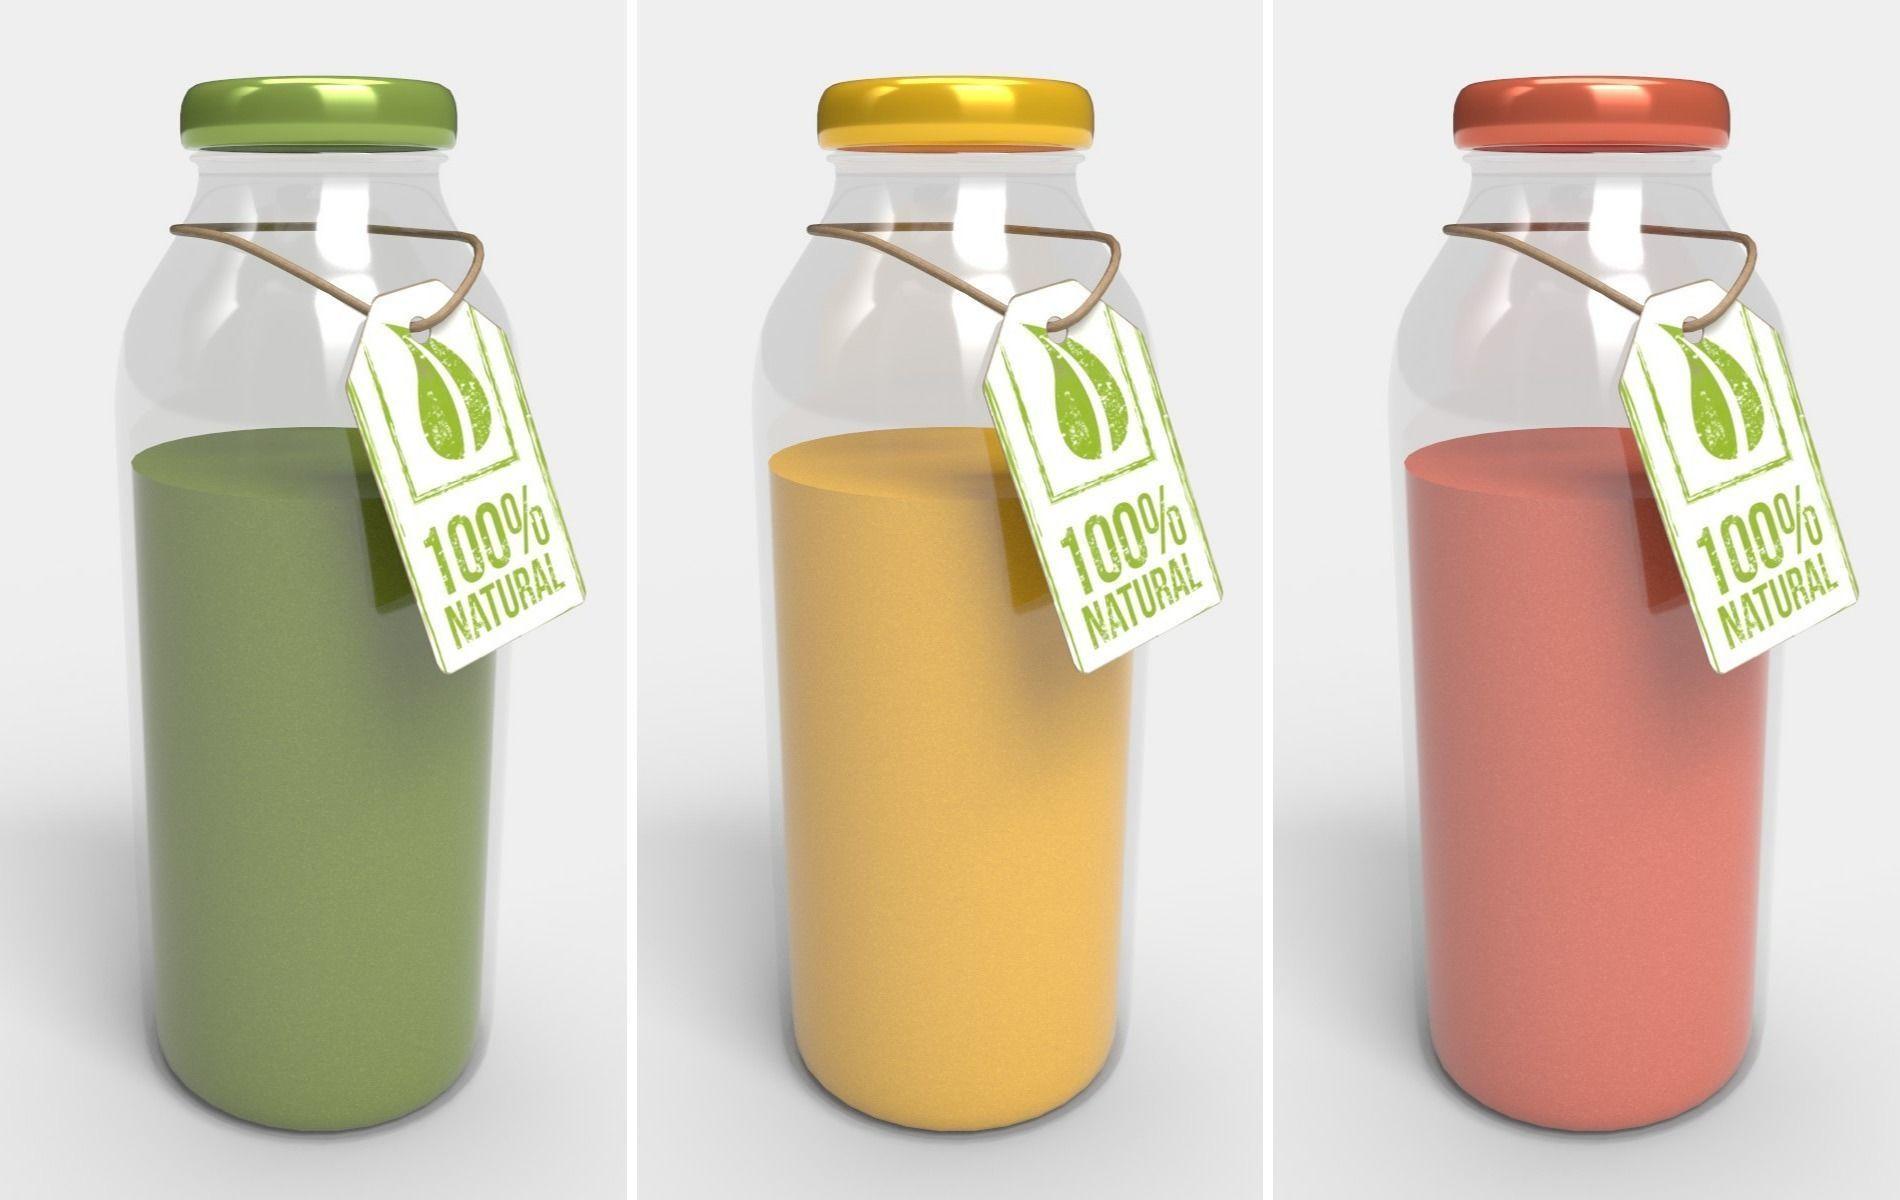 PBR Bottle Juice - Collection